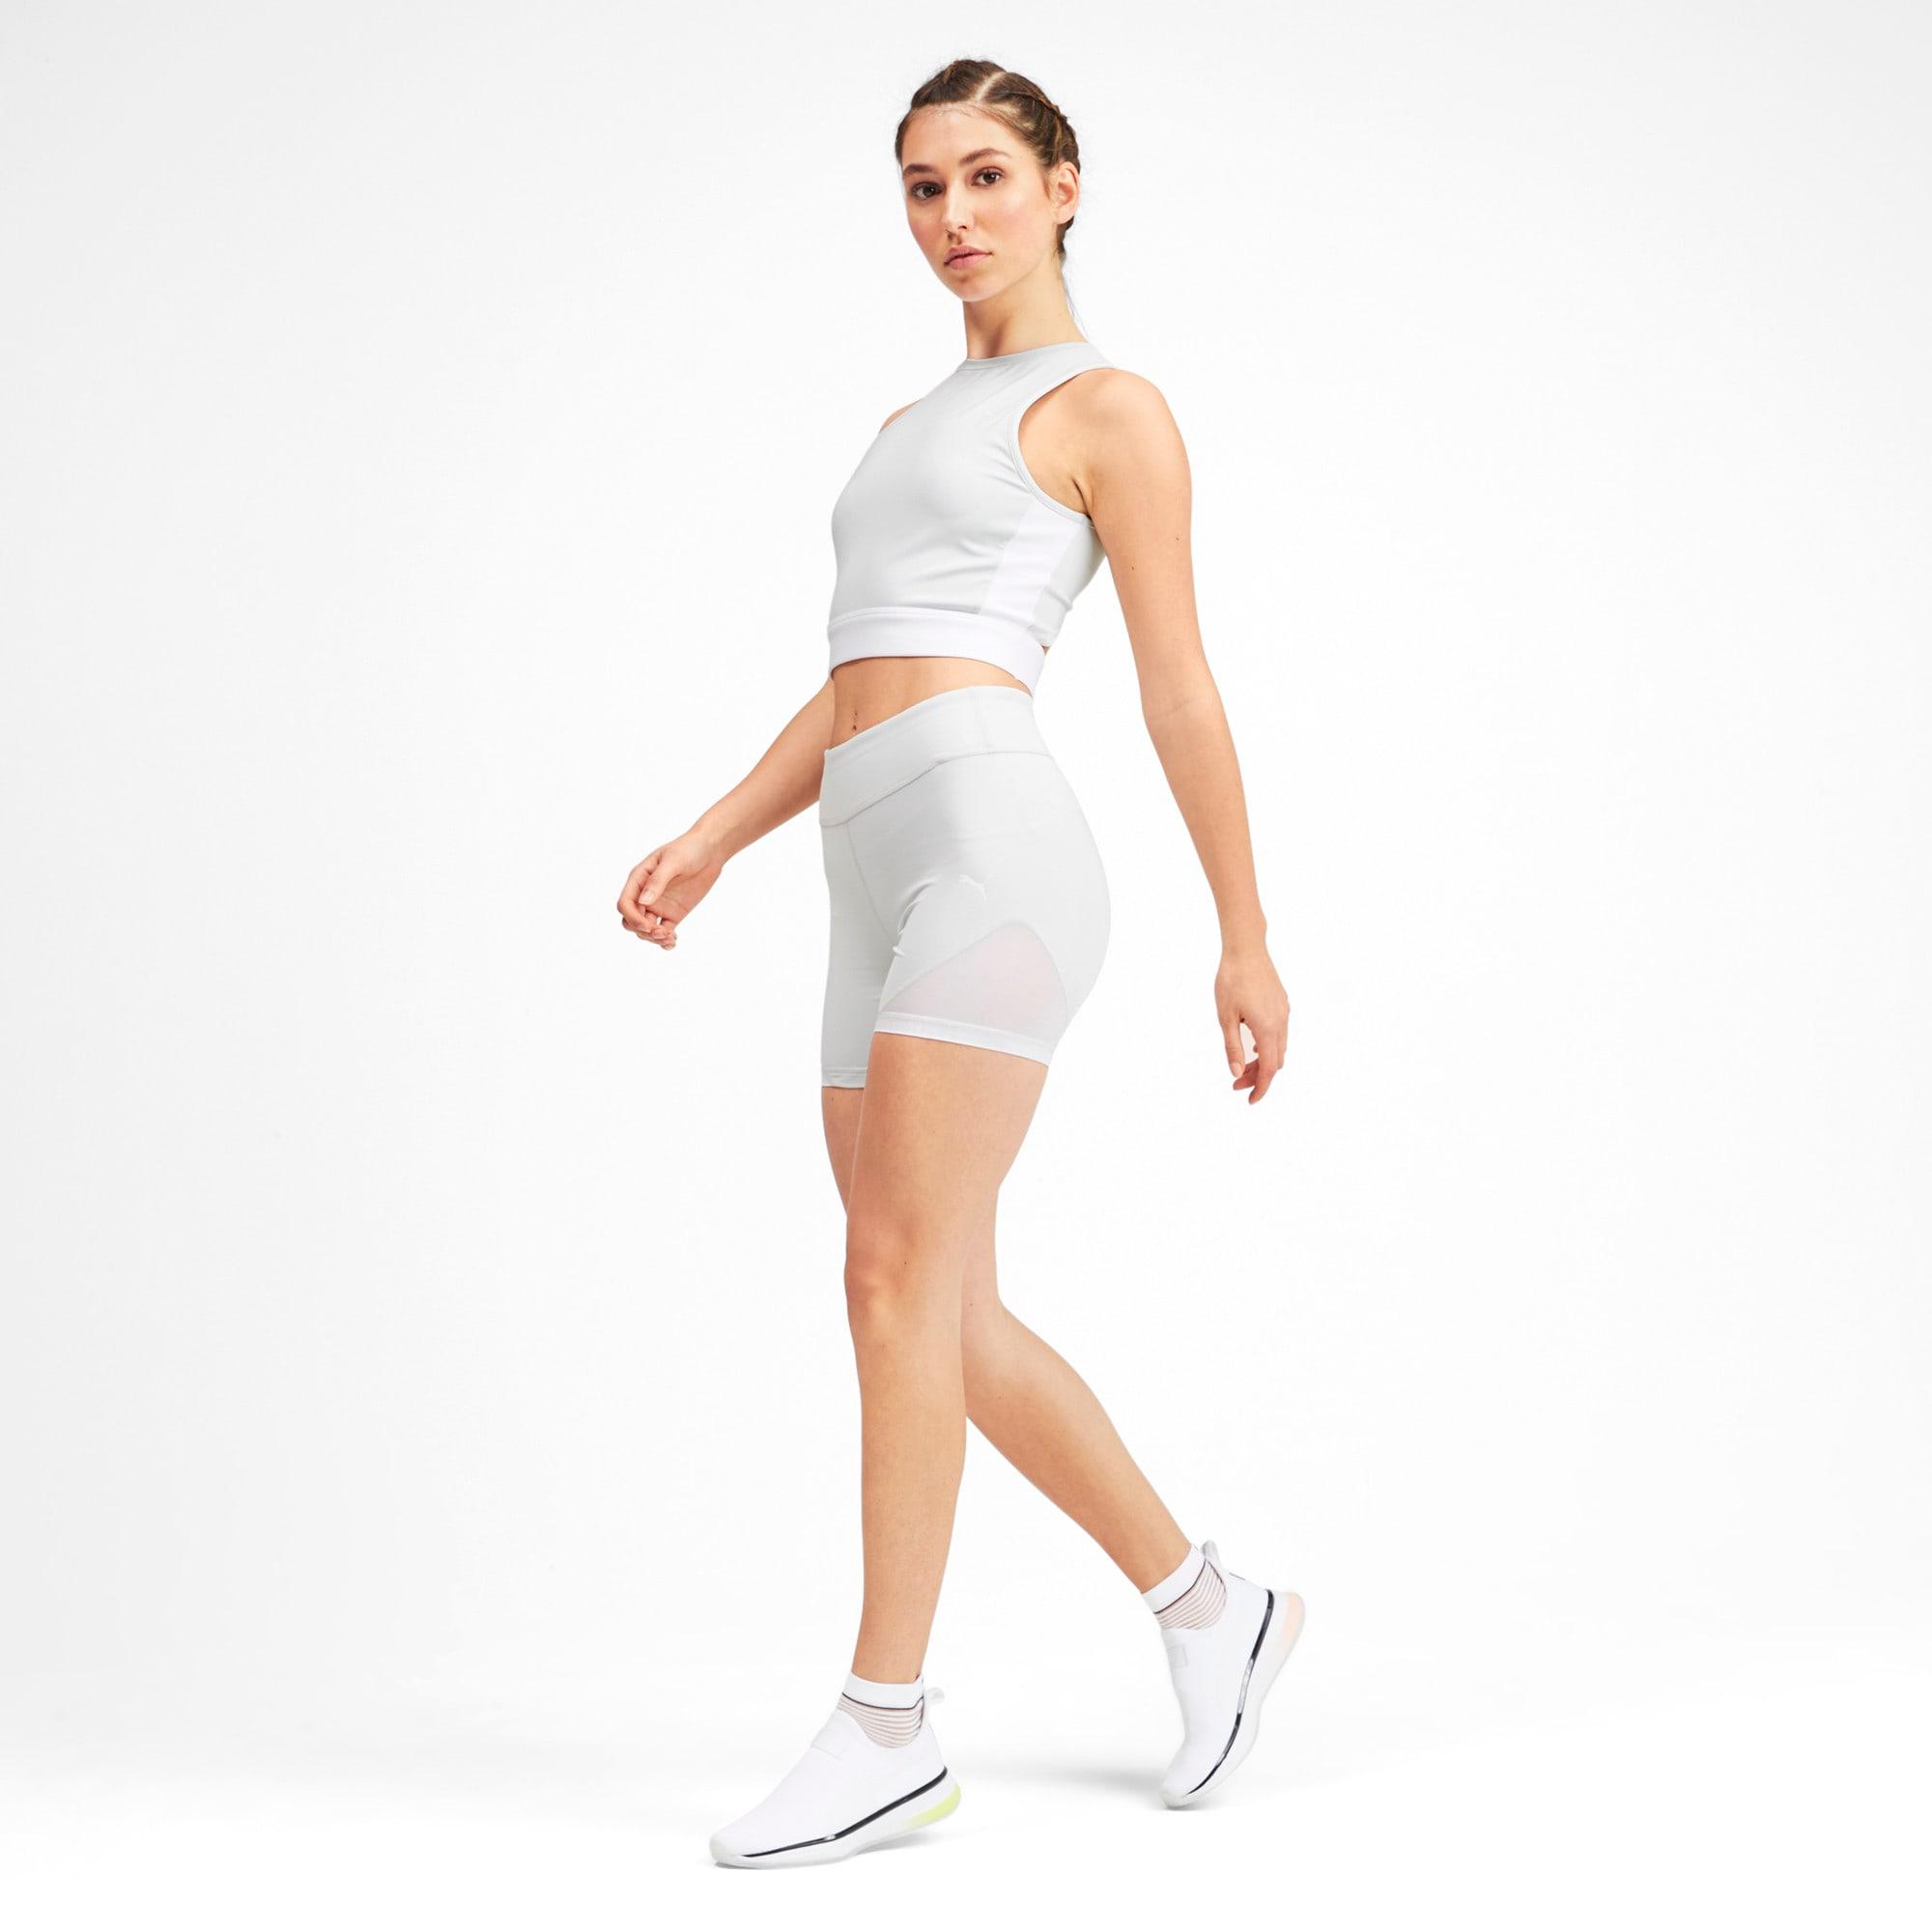 Miniatura 3 de Shorts SG x PUMA, Glacier Gray-Puma White, mediano